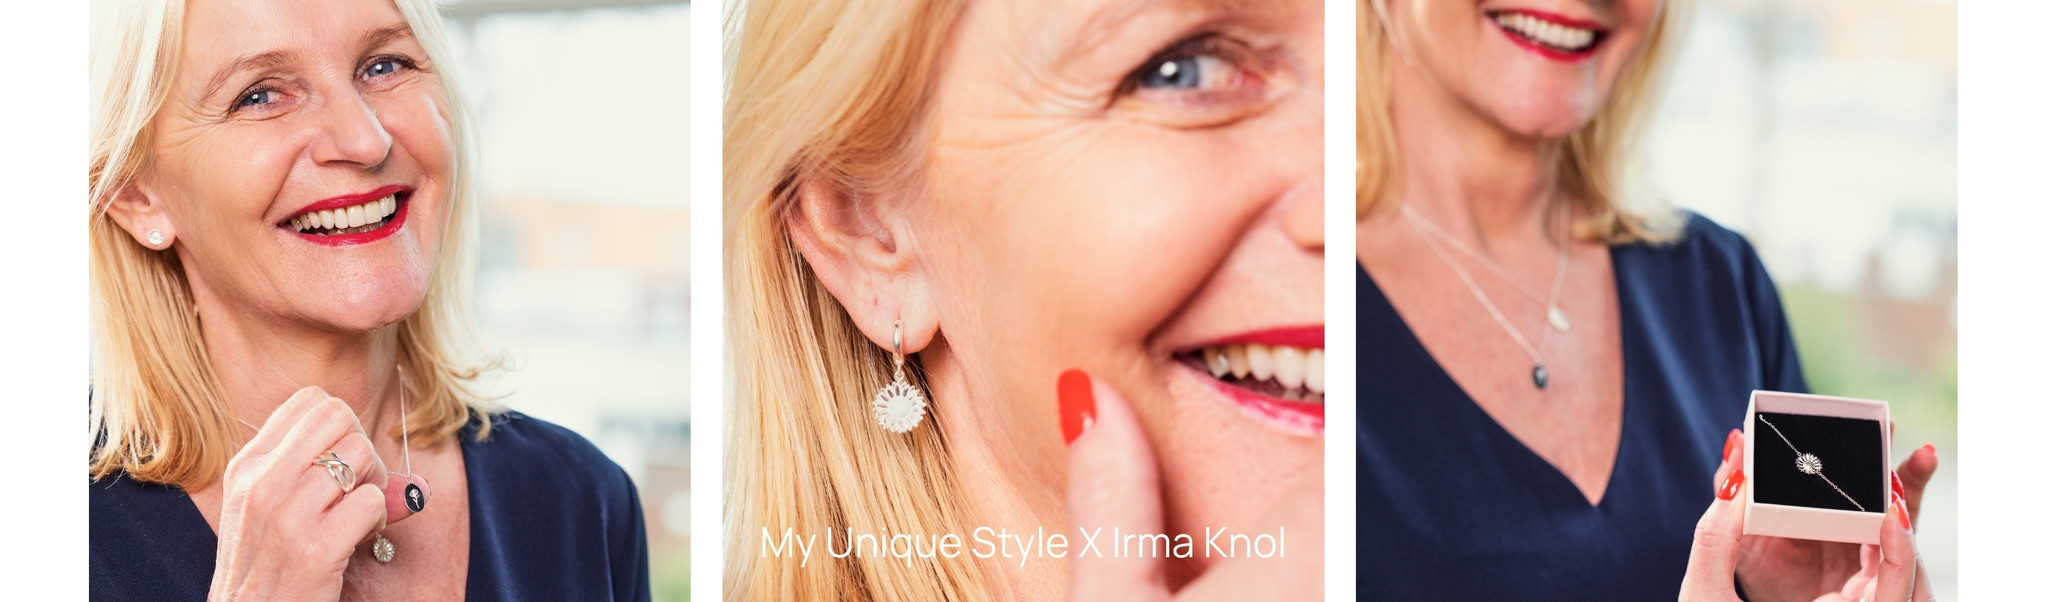 My Unique Style X Irma Knol 4